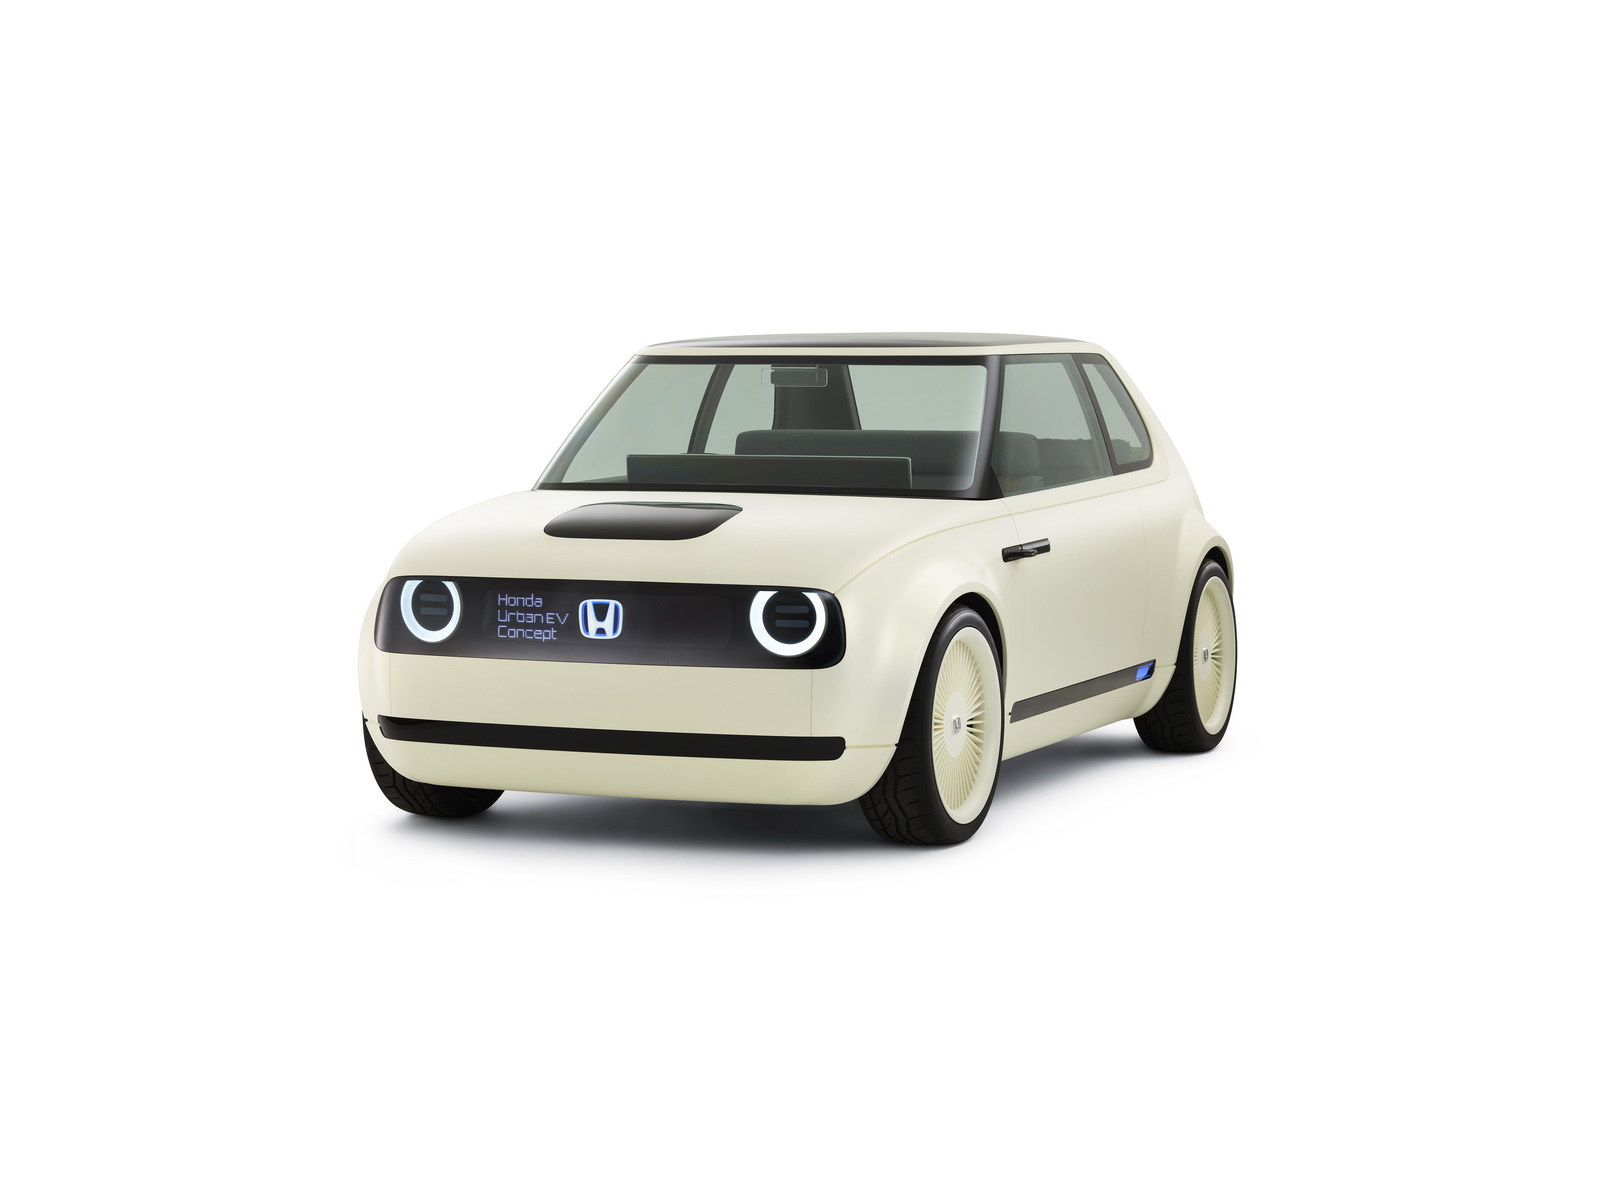 Honda_Urban_EV_Concept_02.jpg